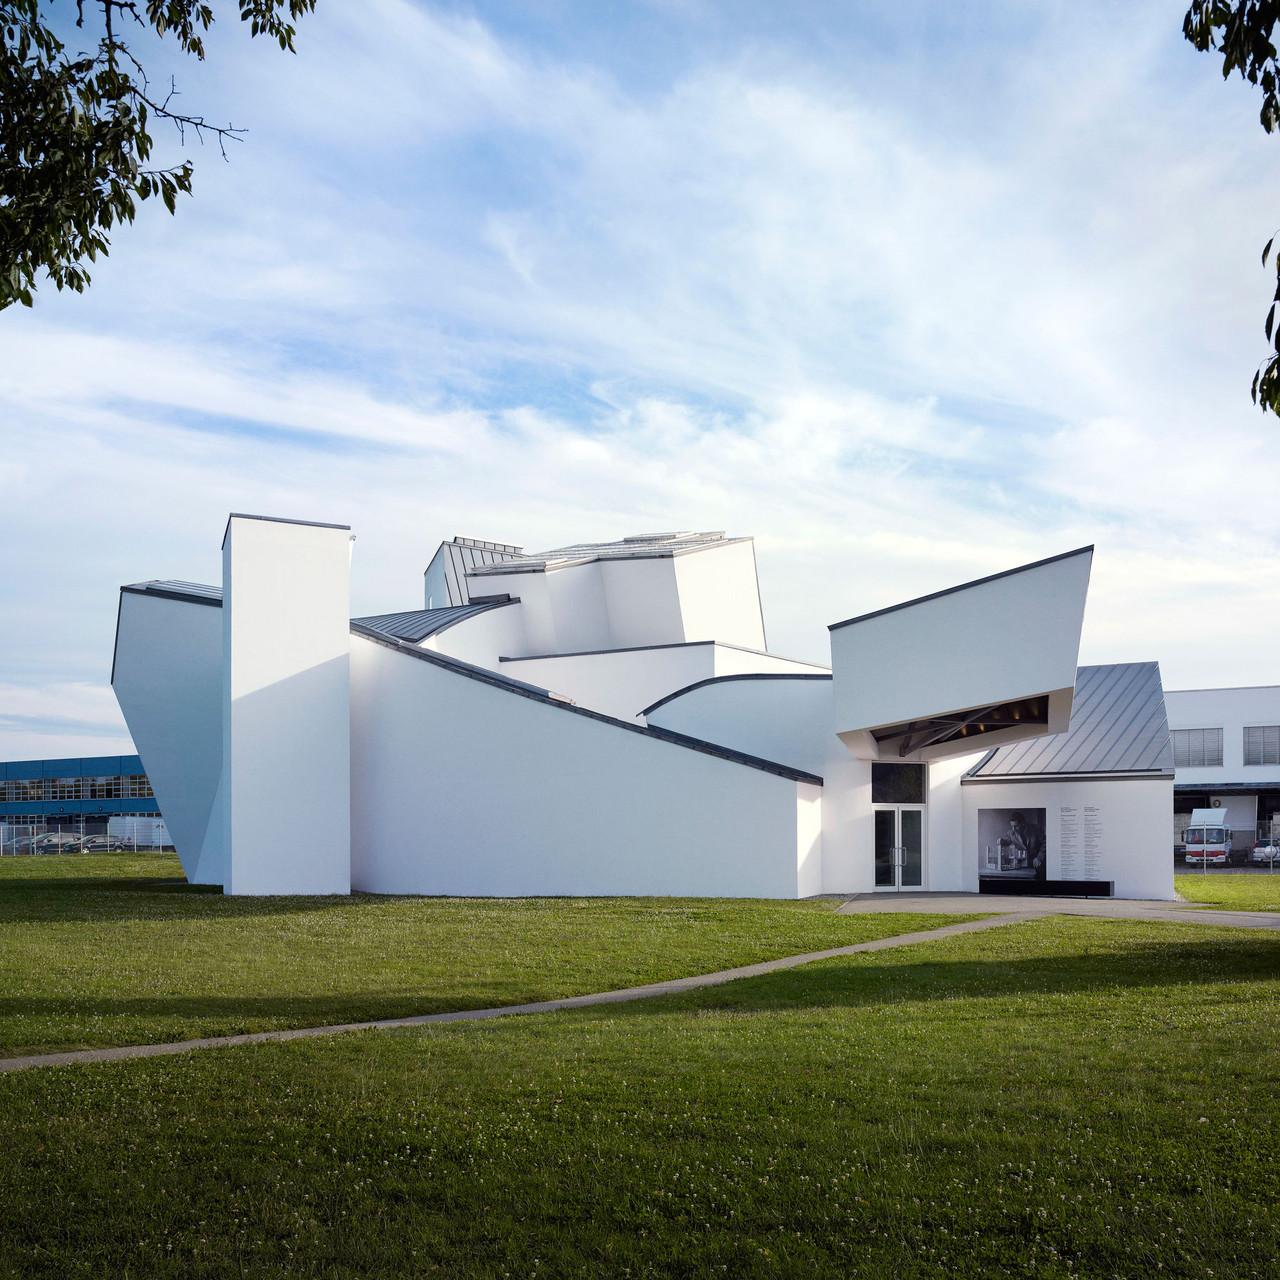 Vitra Design Museum, Frank Gehry, 1989 © Vitra, Foto: Julien Lanoo